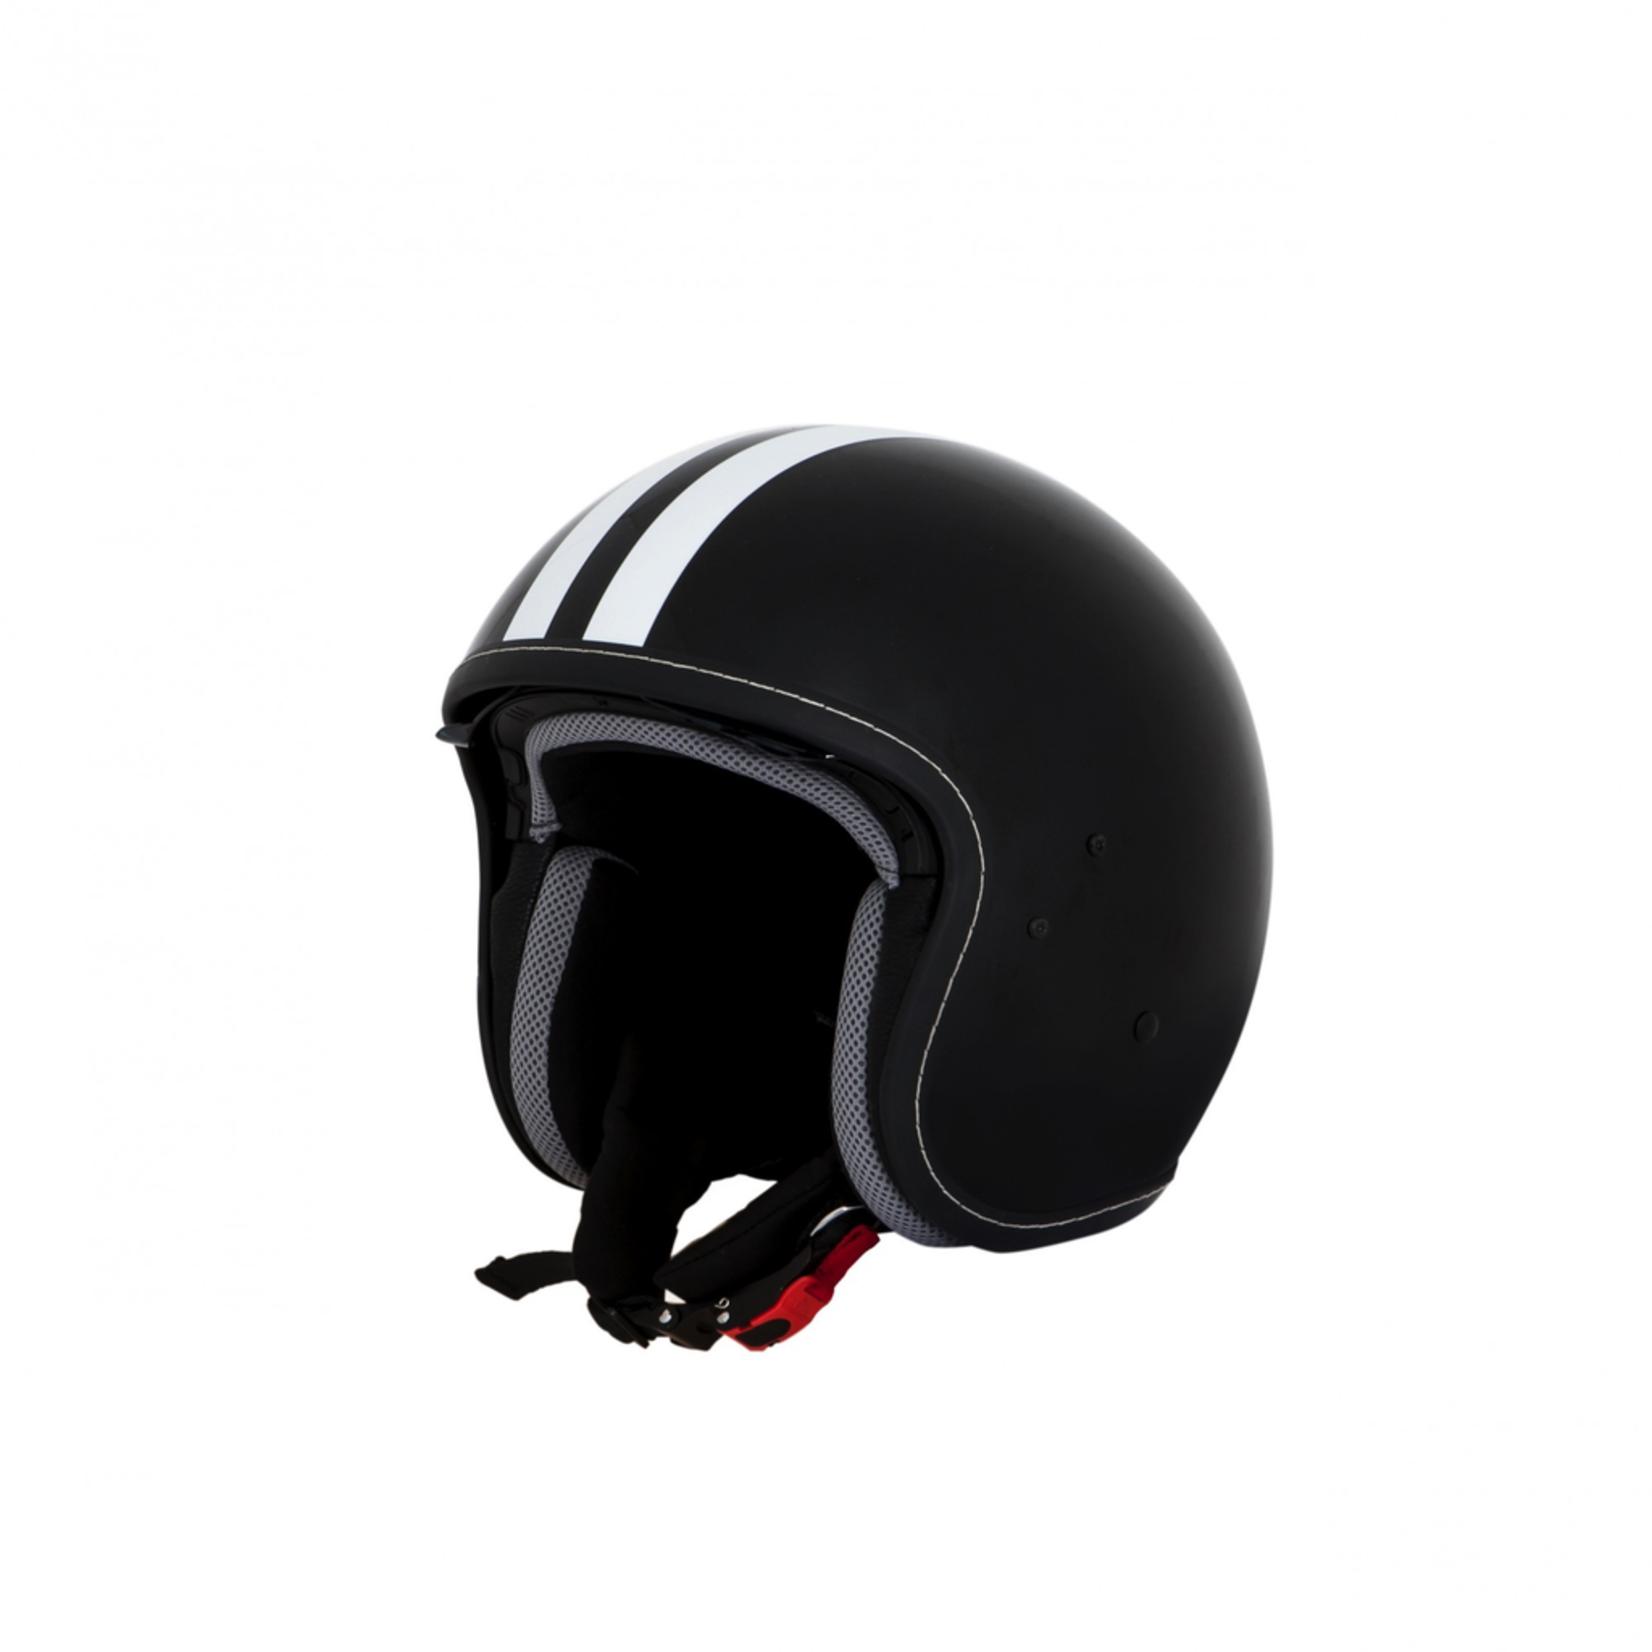 Apparel Helmet, Vespa Jet Fibre Decal Black or White